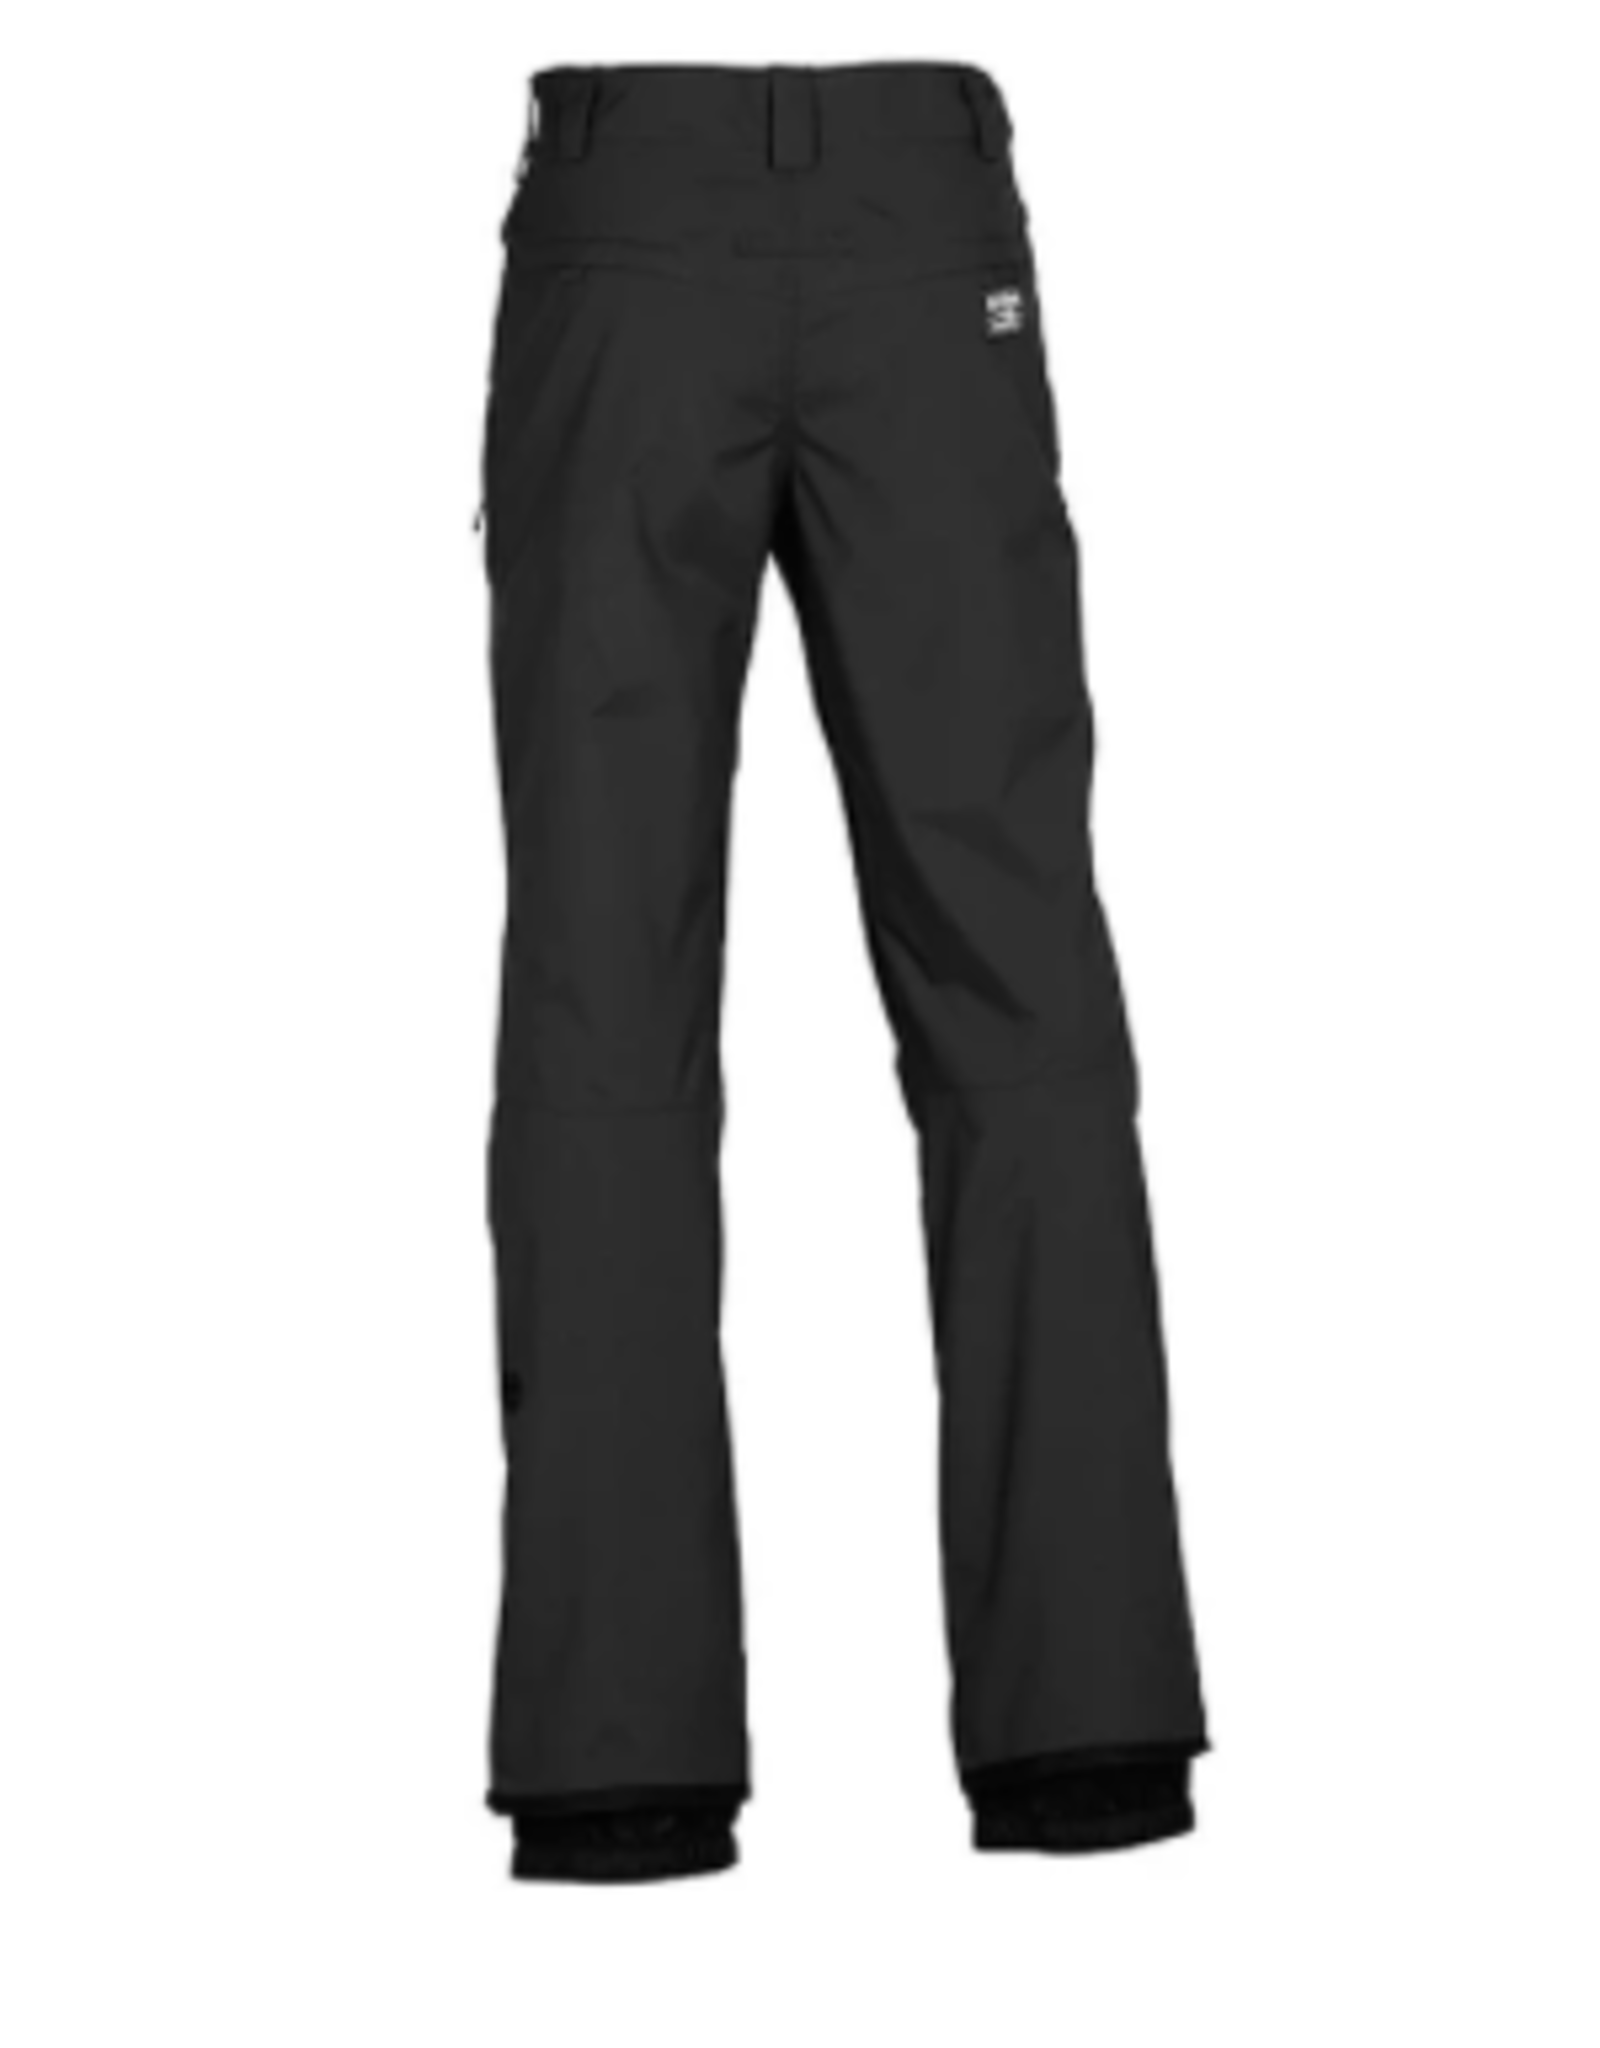 686 Men's Standard Pant Black 2022